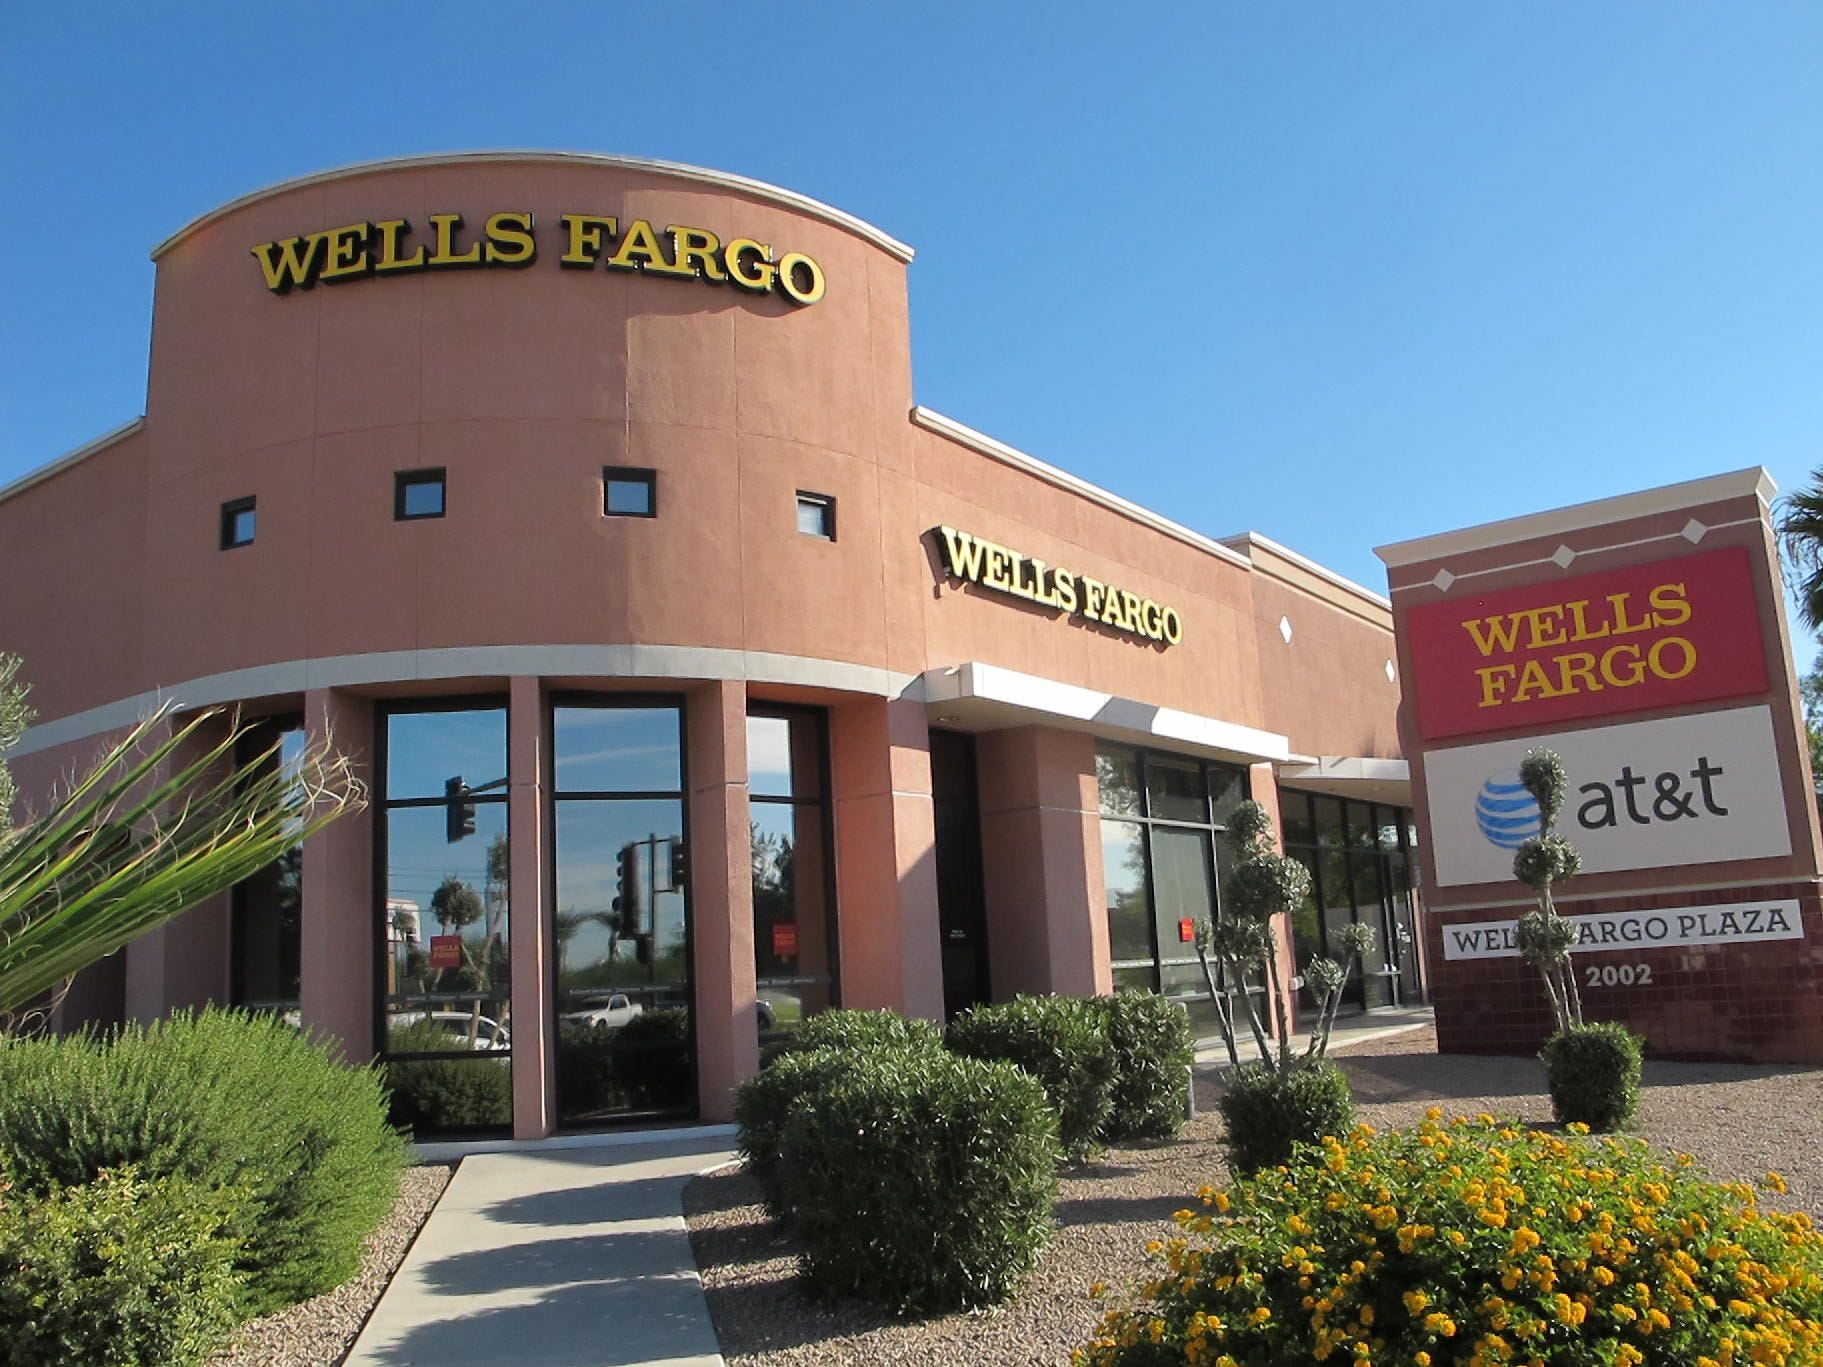 No. 4: Wells Fargo & Co. | Banking, financial services | 2019 employees: 16,161 | 2018 employees:15,637 | Ownership: Public | Headquarters: San Francisco | www.wellsfargo.com